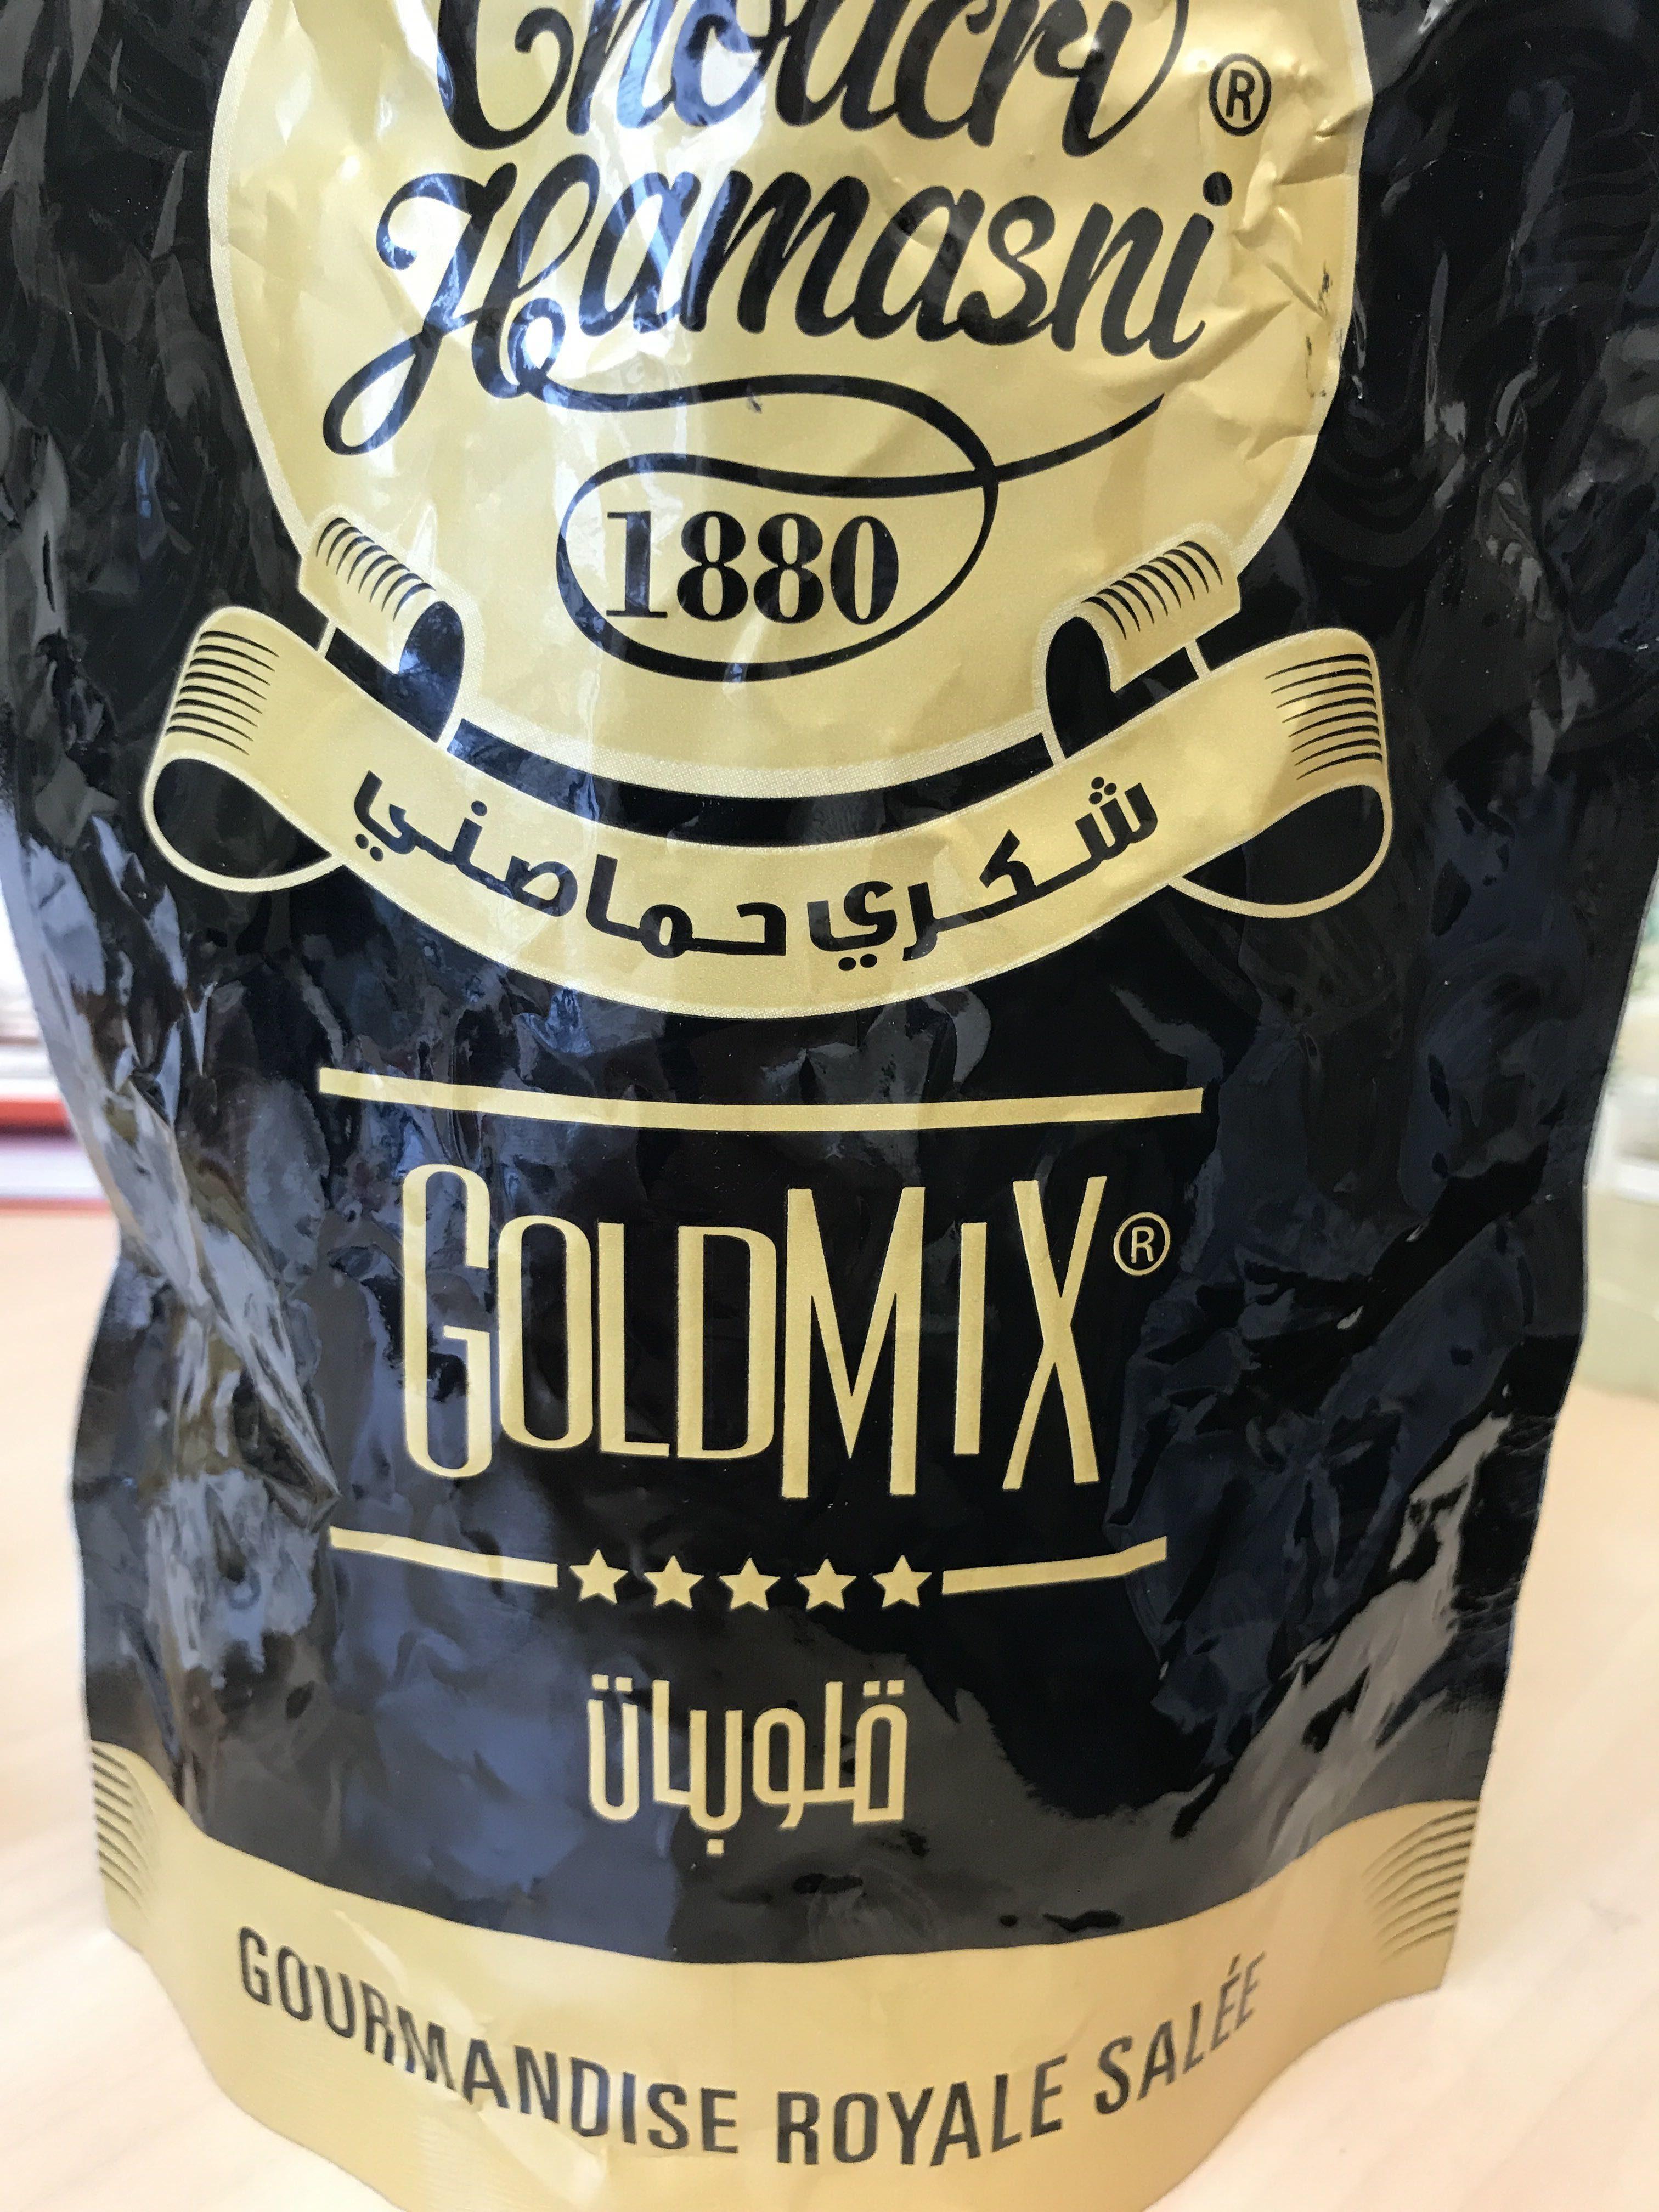 GoldMix gourmandise royale salée - Produit - fr